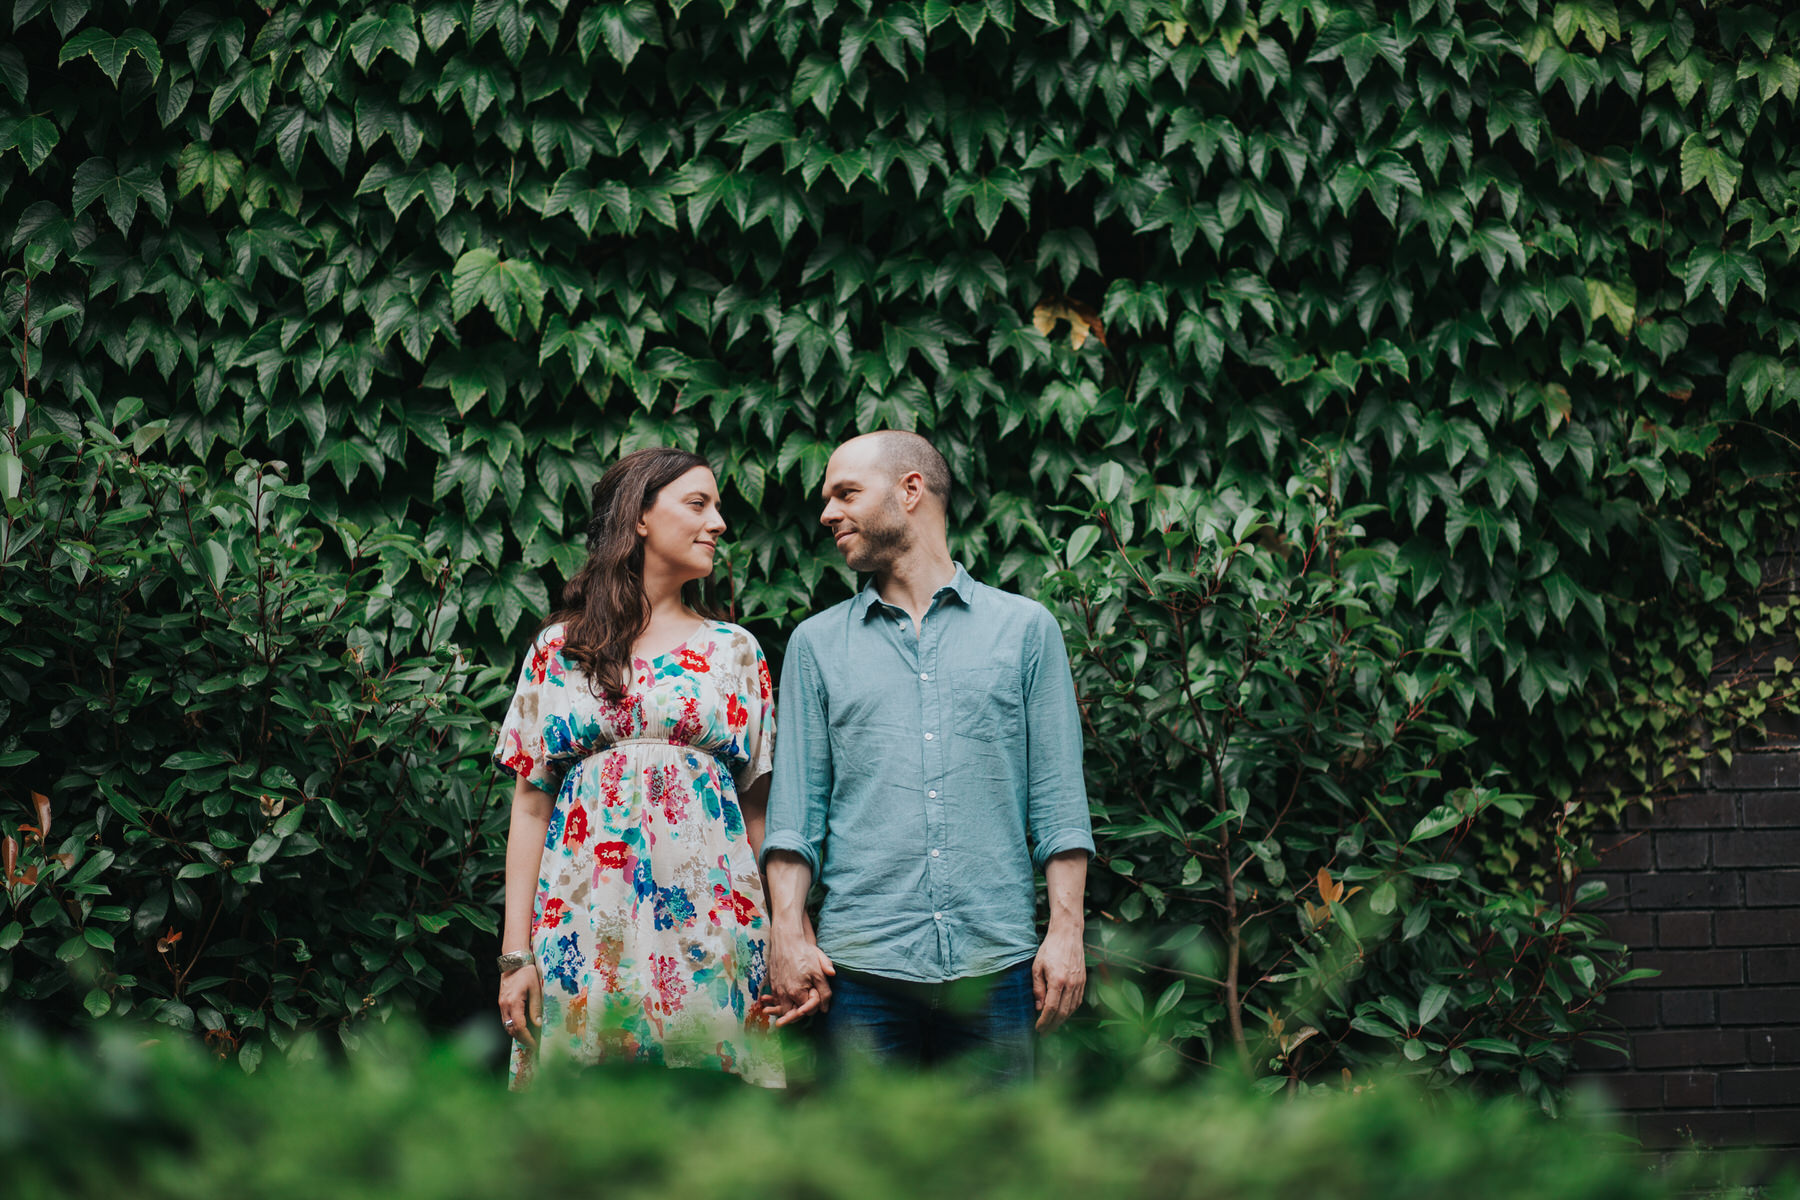 37-couple ivy wall background alternative portraits London Southbank.jpg